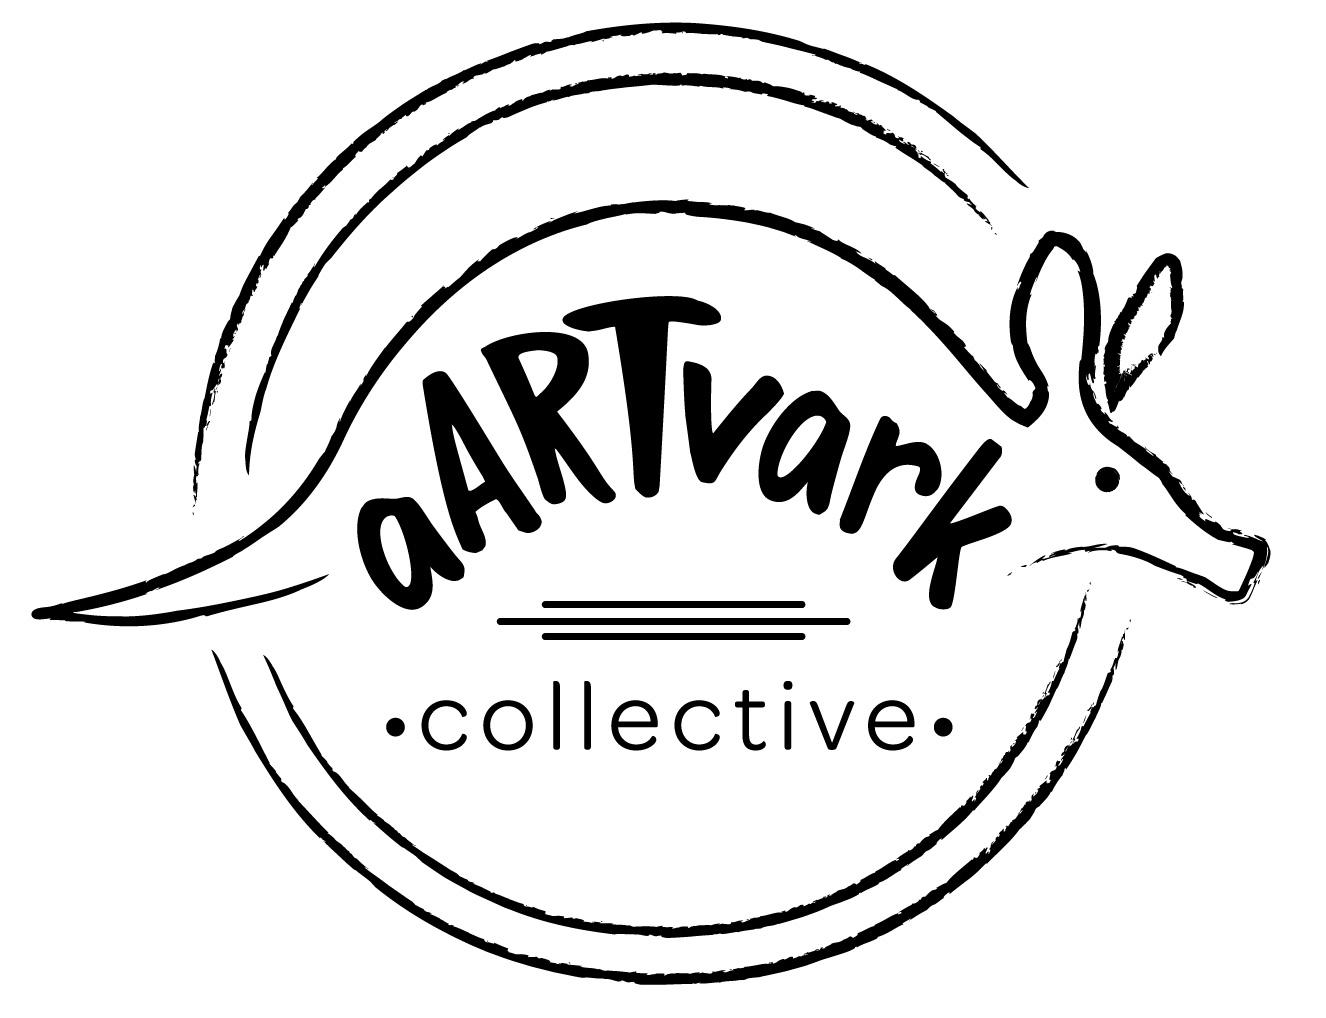 138_AartvarkCollective_Logo_03_FA-02.jpg